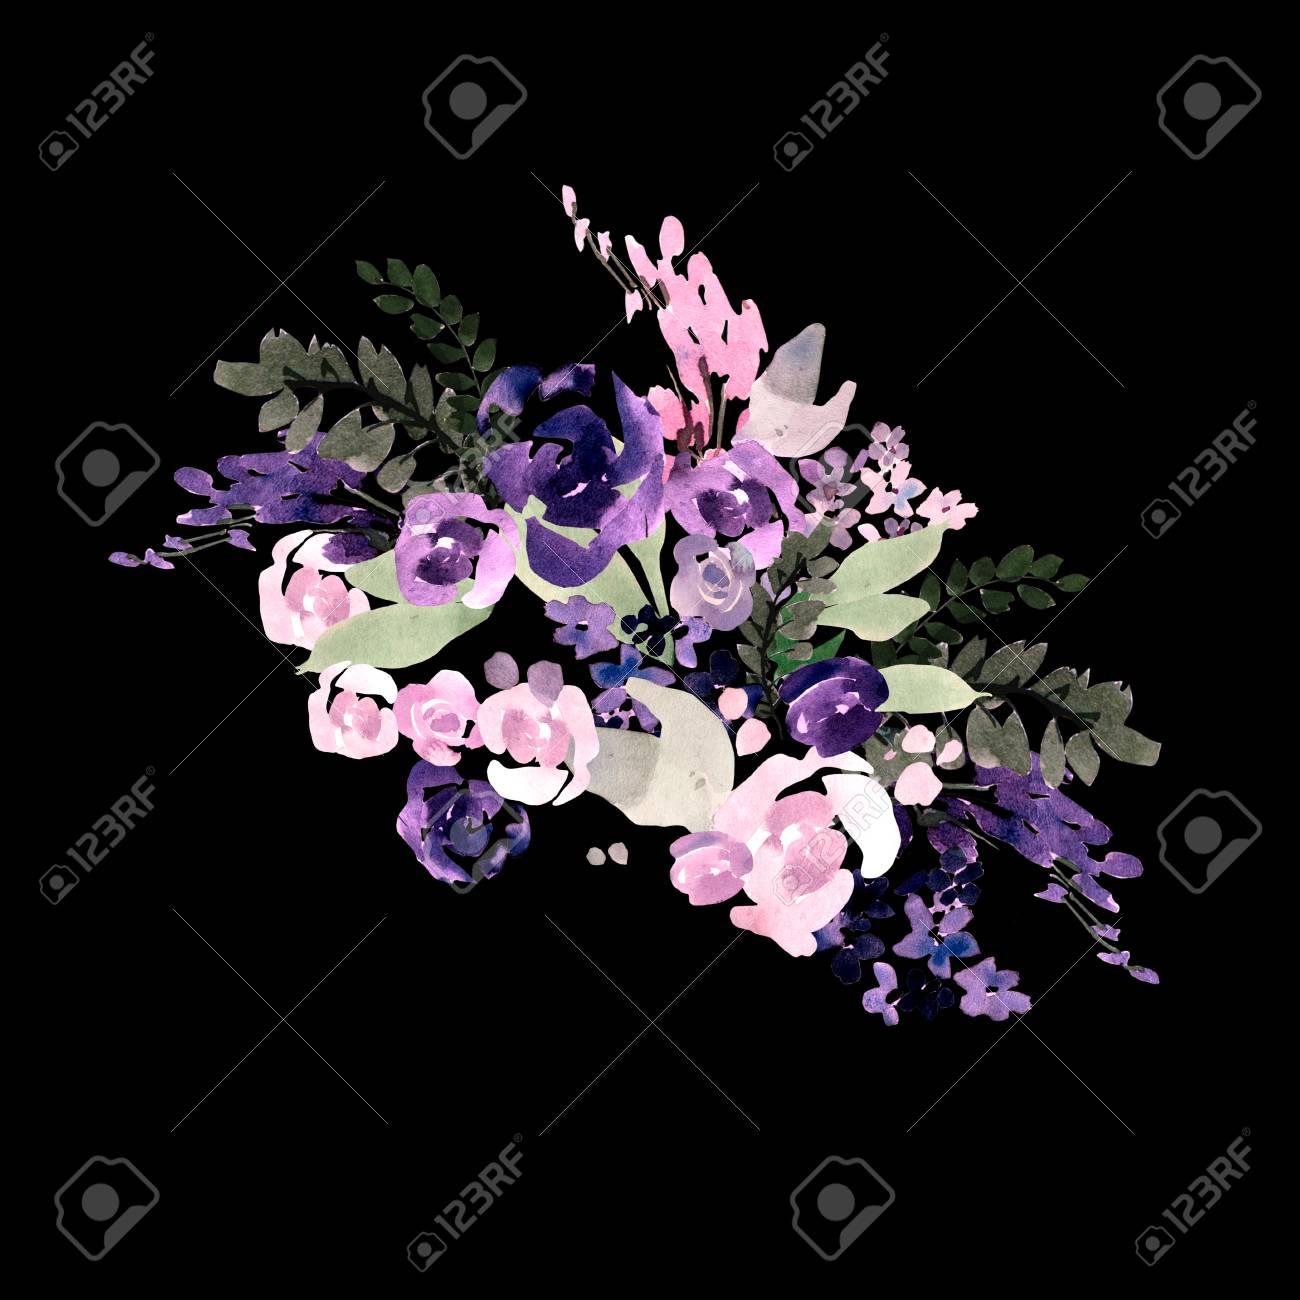 Beautiful watercolor wedding bouquet with purple flowers beautiful watercolor wedding bouquet with purple flowers illustration stock illustration 97550185 izmirmasajfo